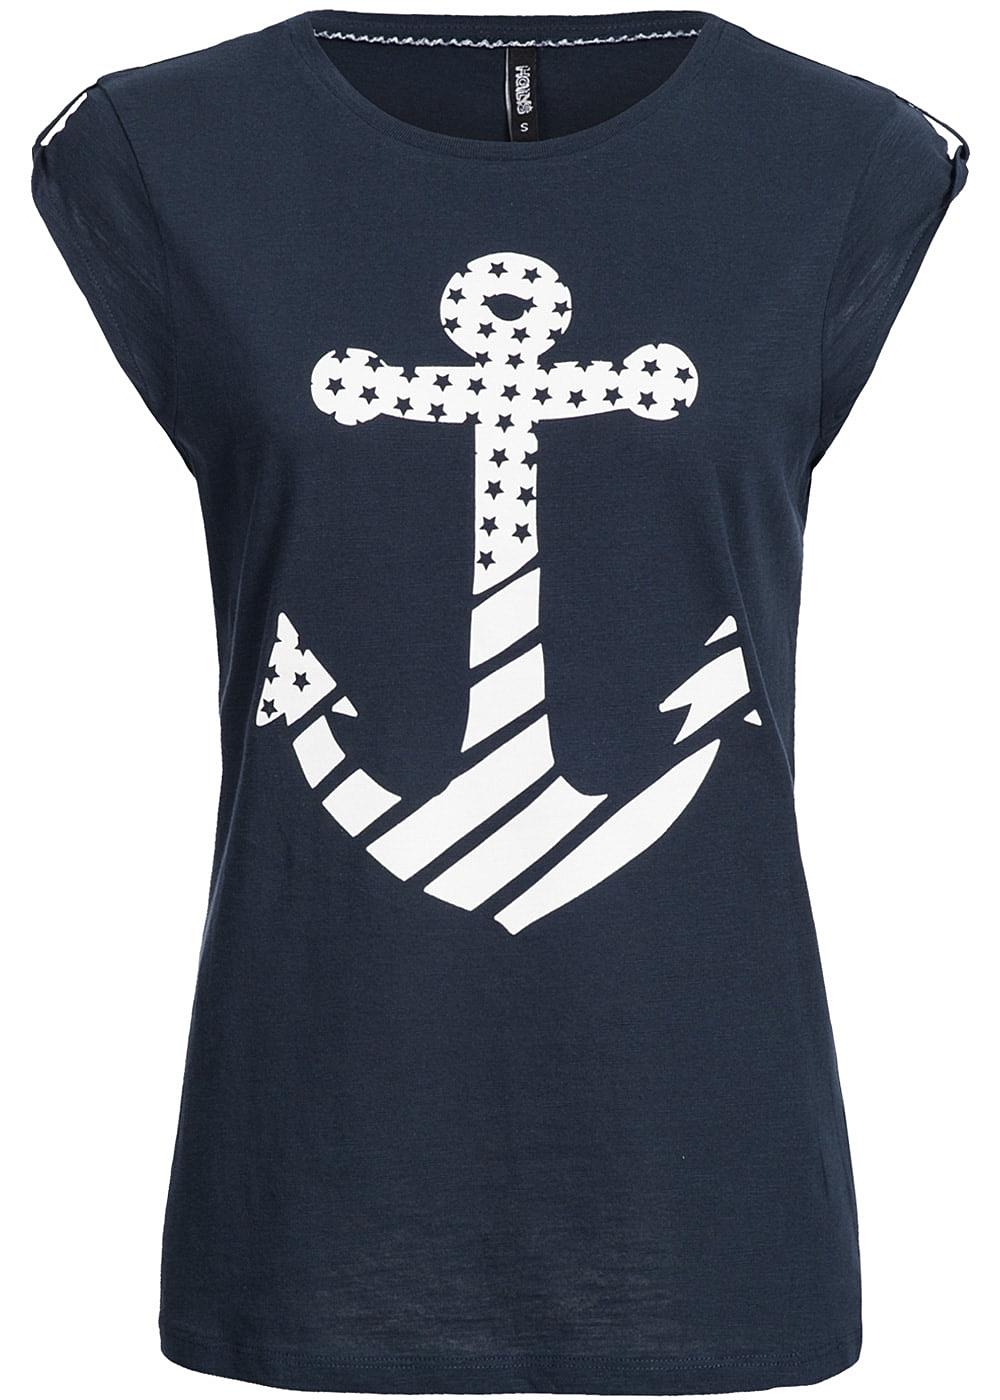 hailys damen t shirt kurzarm anker print navy weiss 77onlineshop. Black Bedroom Furniture Sets. Home Design Ideas